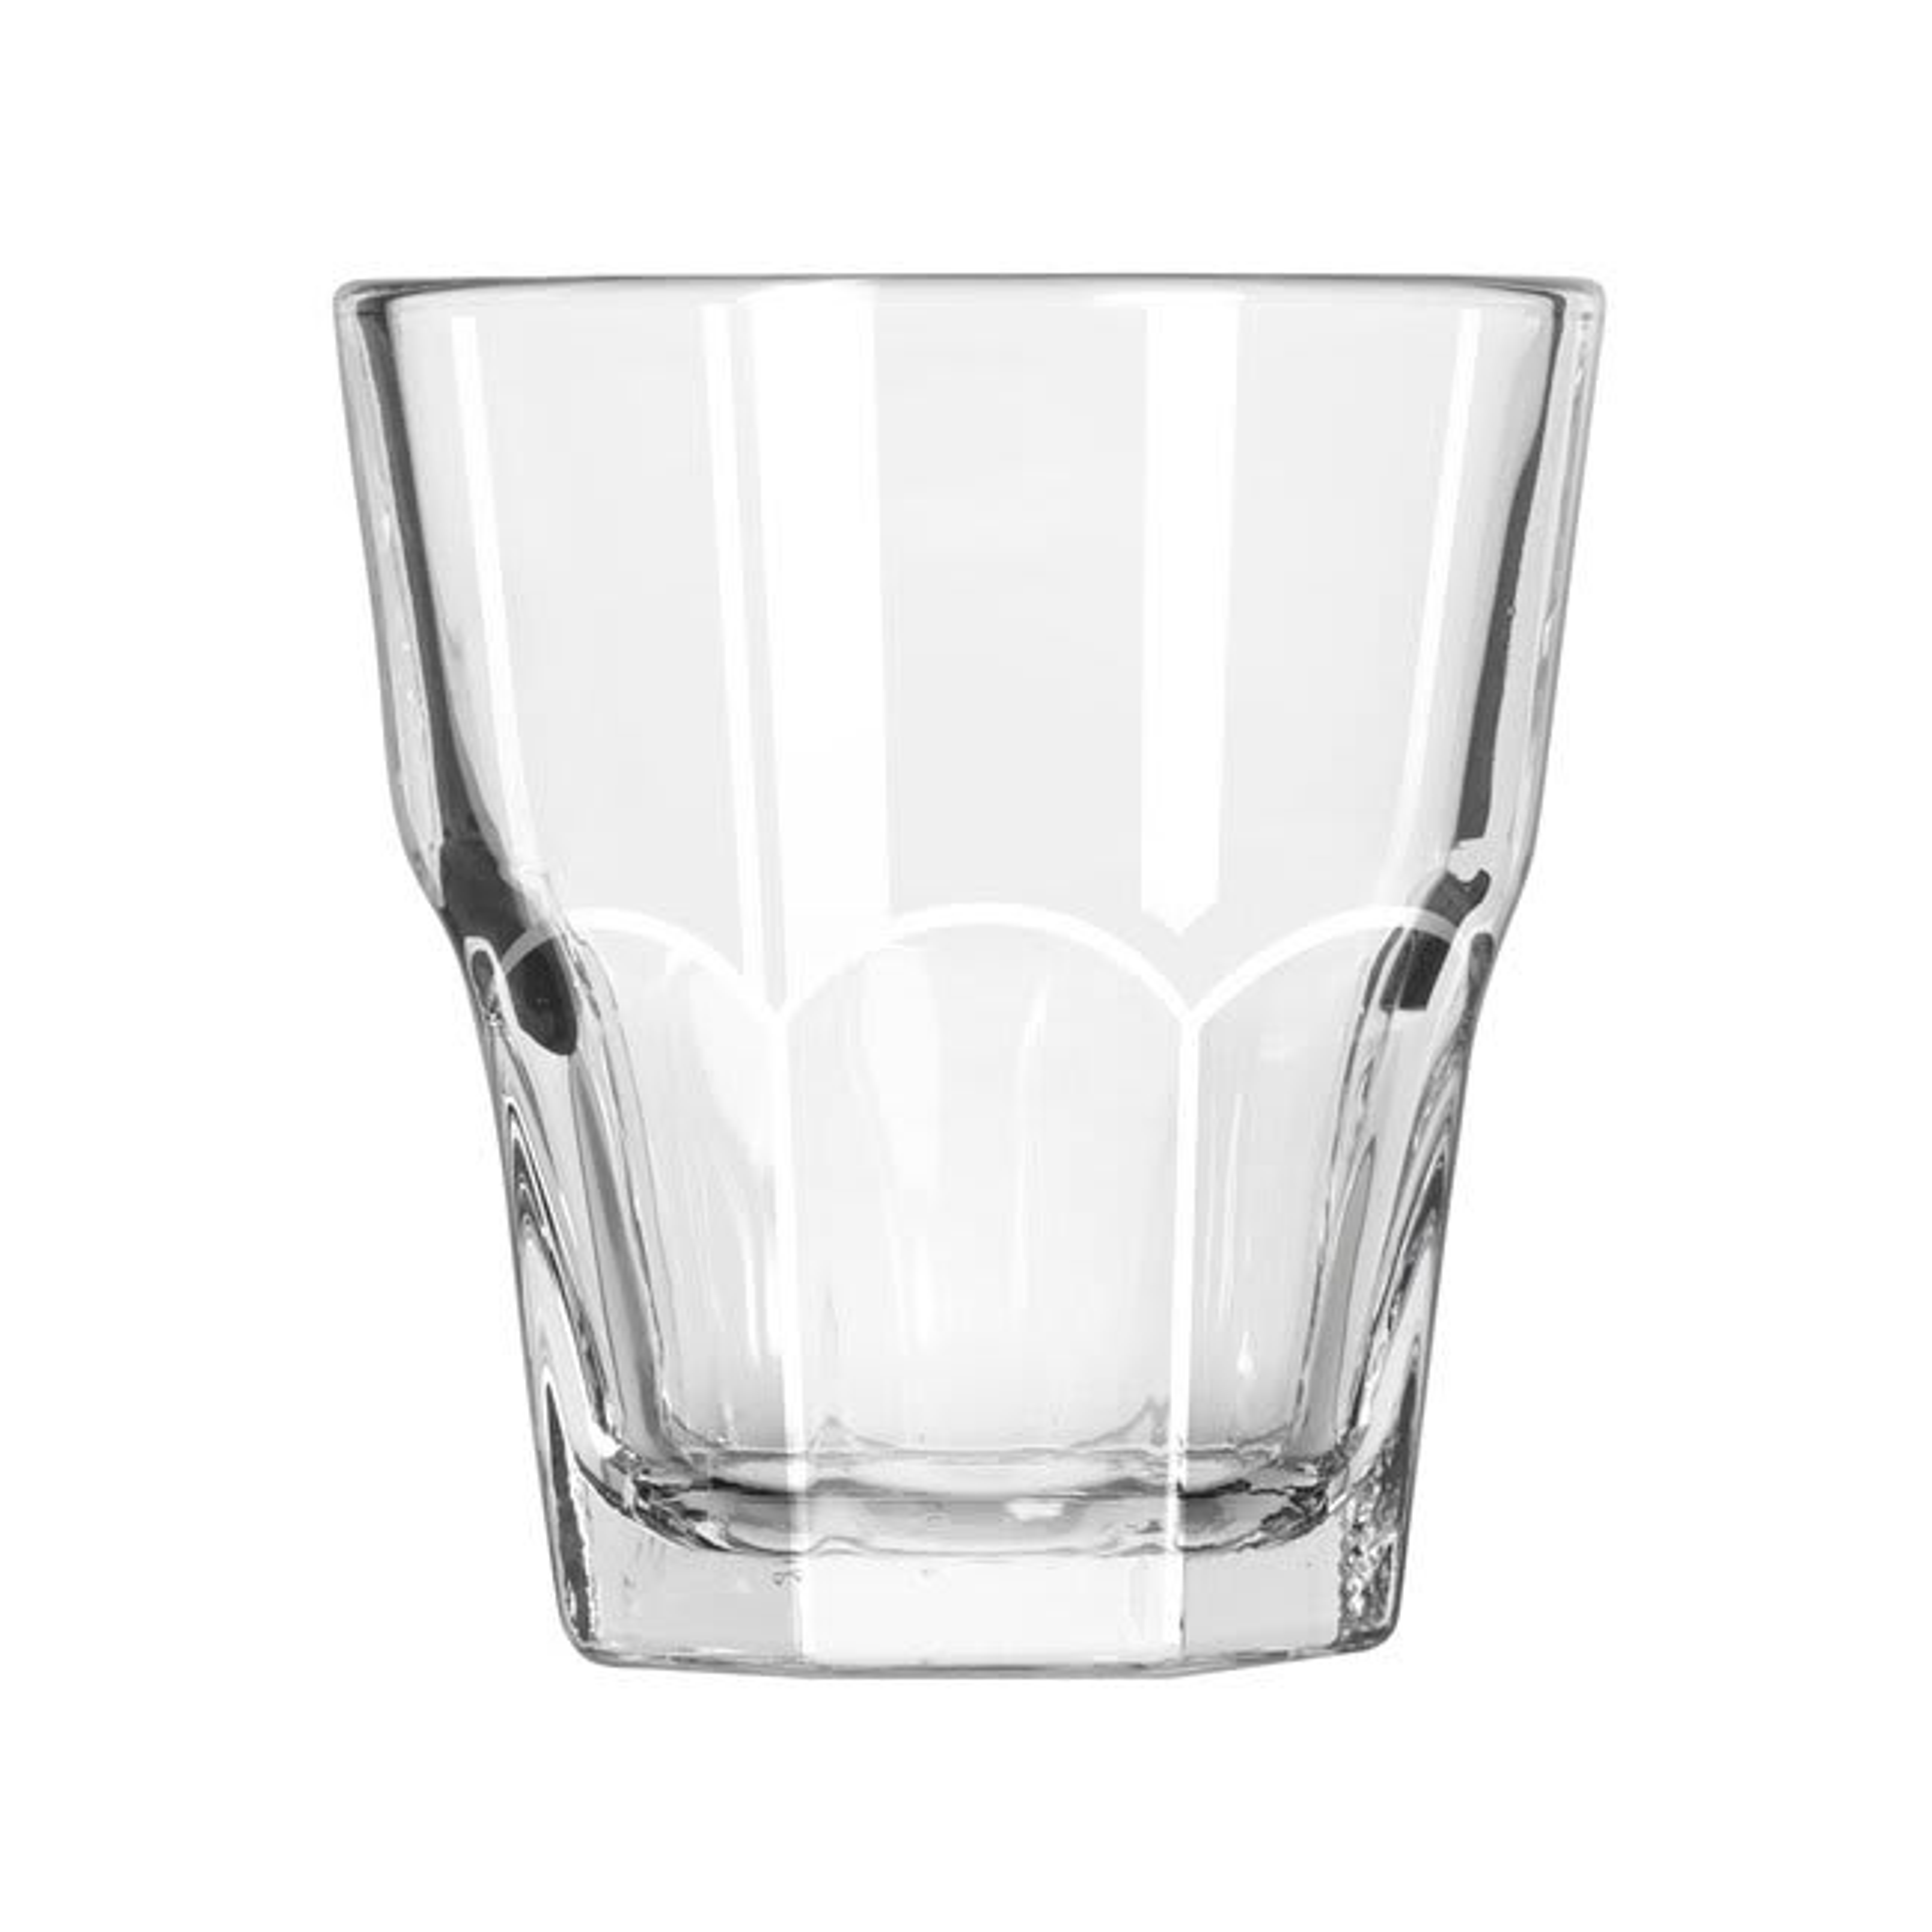 Libbey 15249 5.5-oz Rocks Glass - Gibraltar